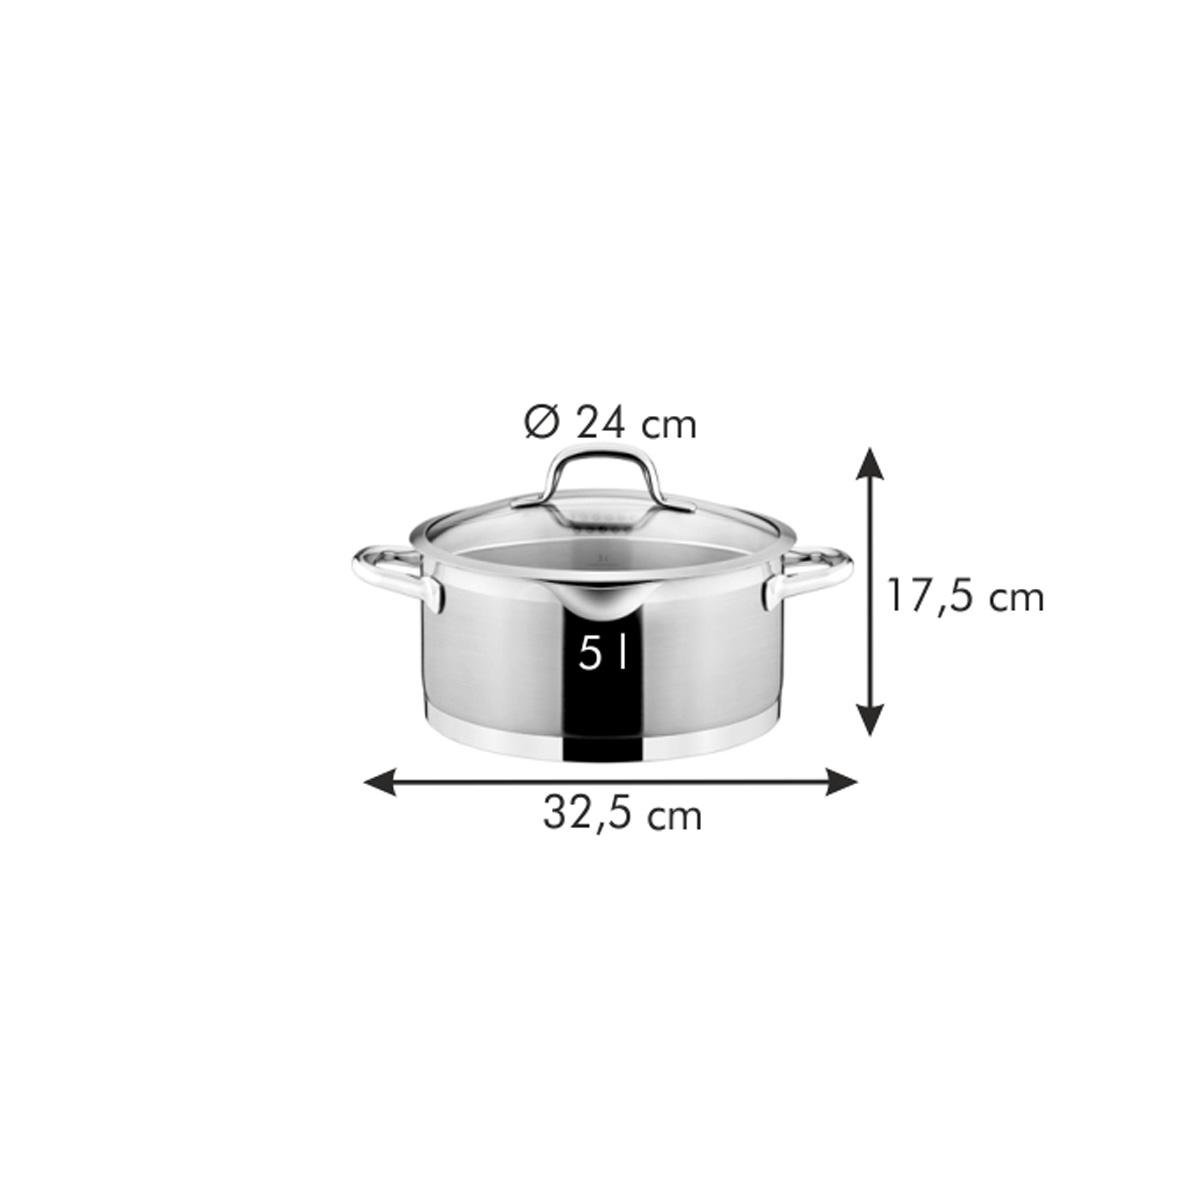 Kastrol PRESIDENT s cedicí poklicí ø 24 cm, 5.0 l